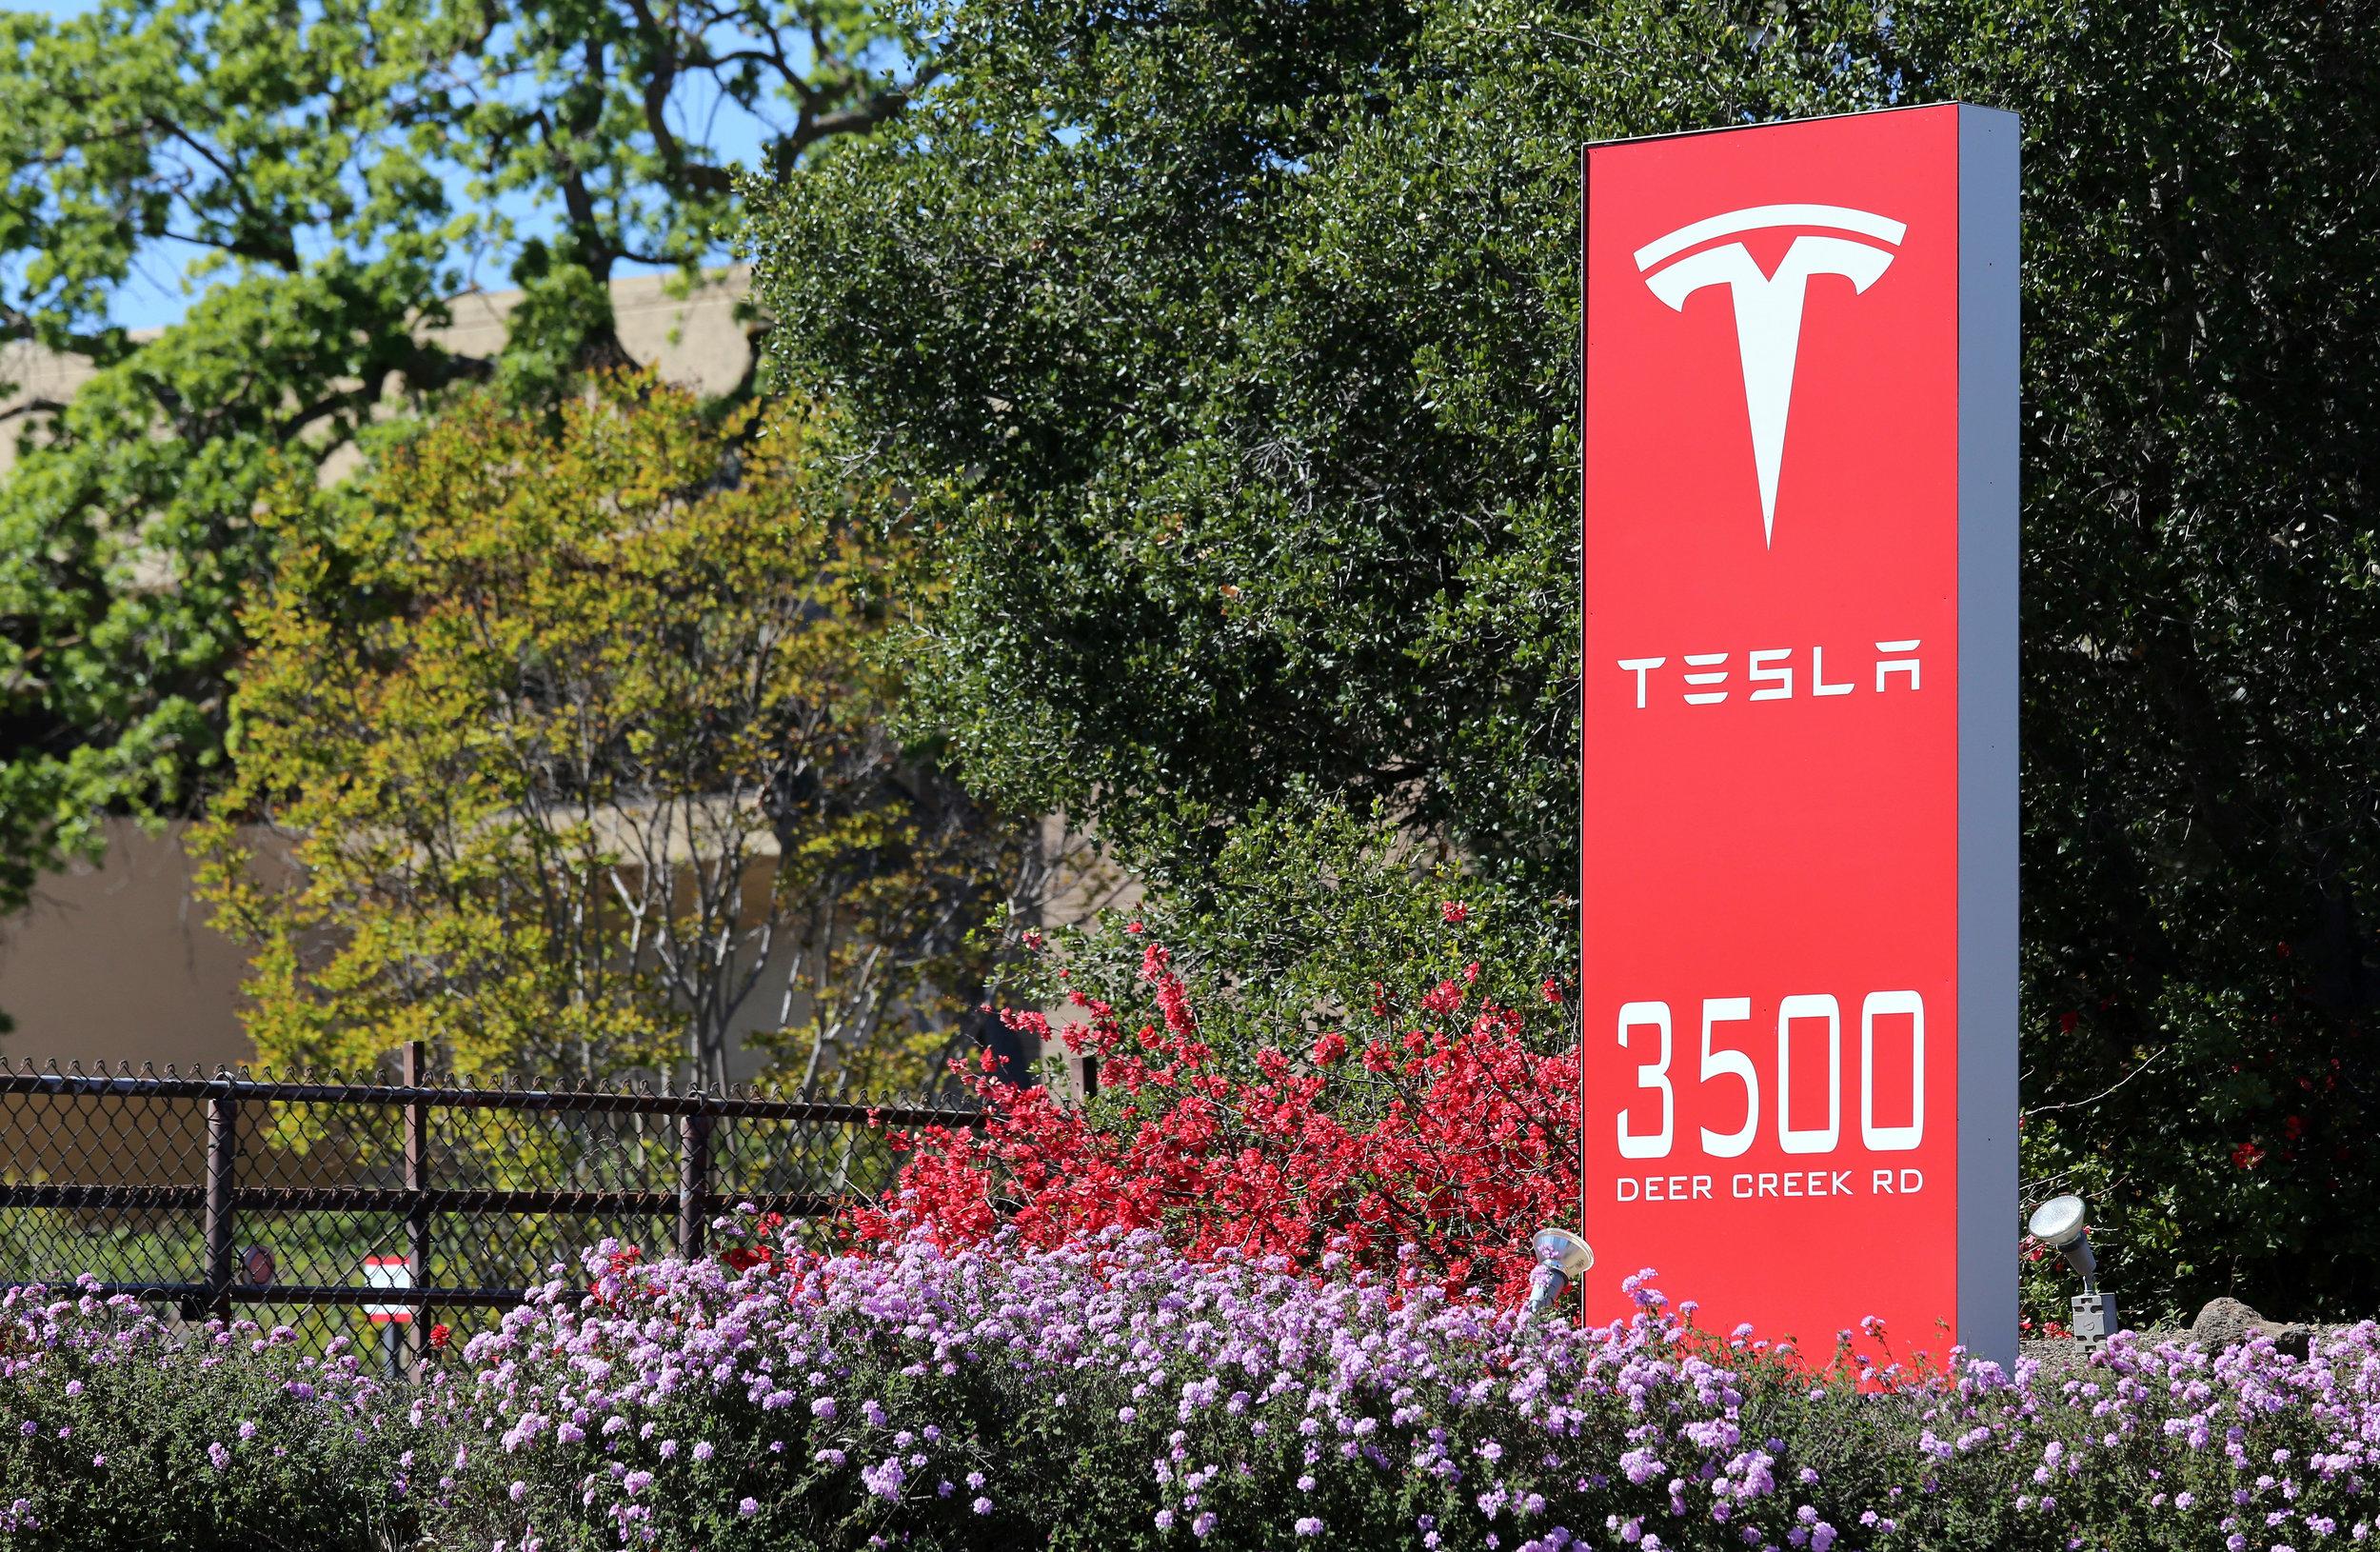 Tesla Los Altos HIlls Blu Skye Media-4K.jpeg